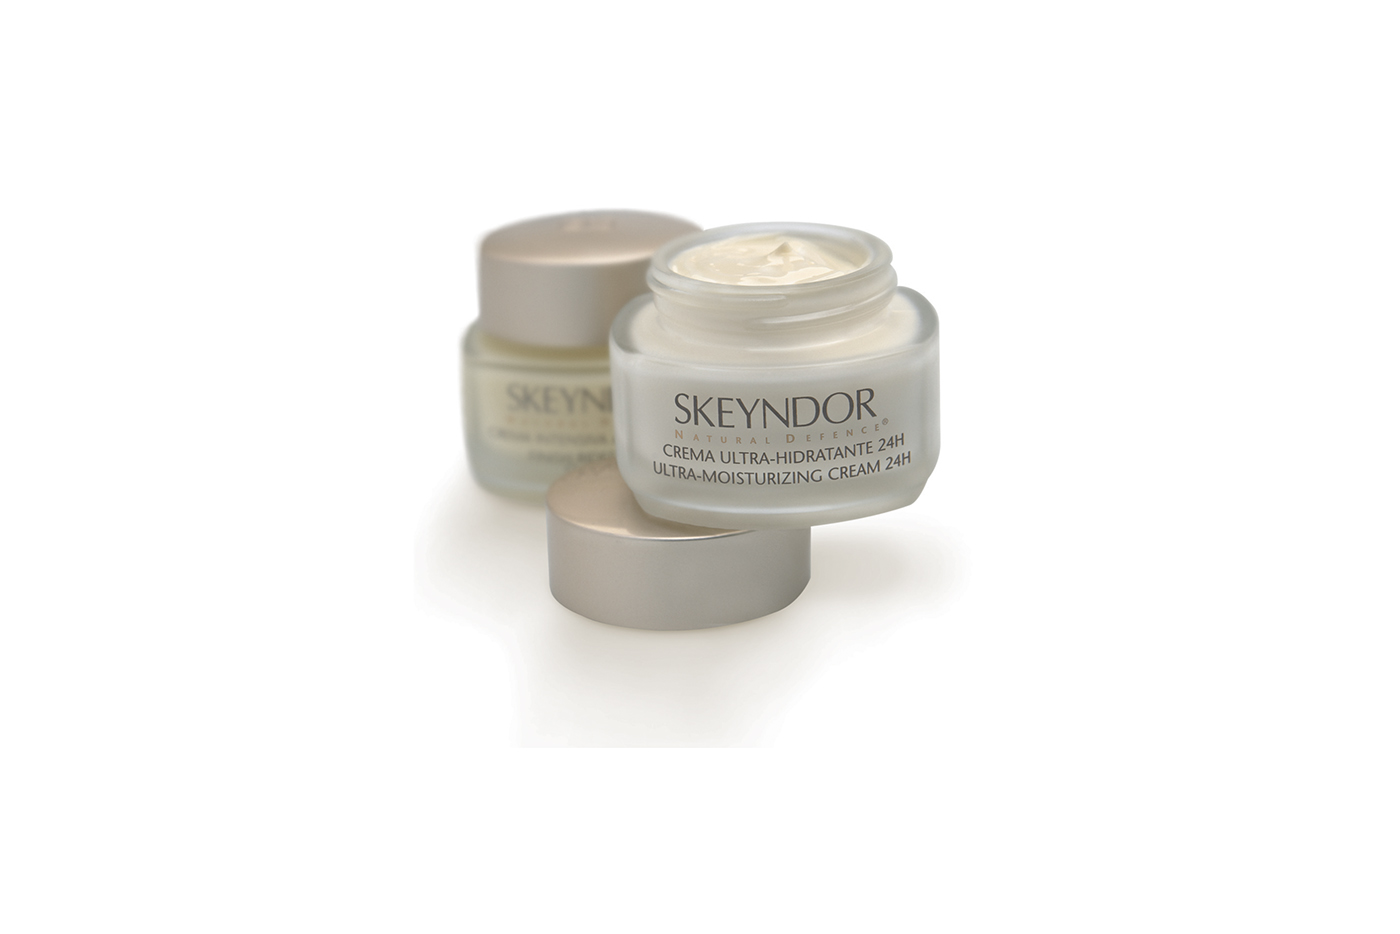 Skeyndor's Ultra-Moisturizing Cream 24H